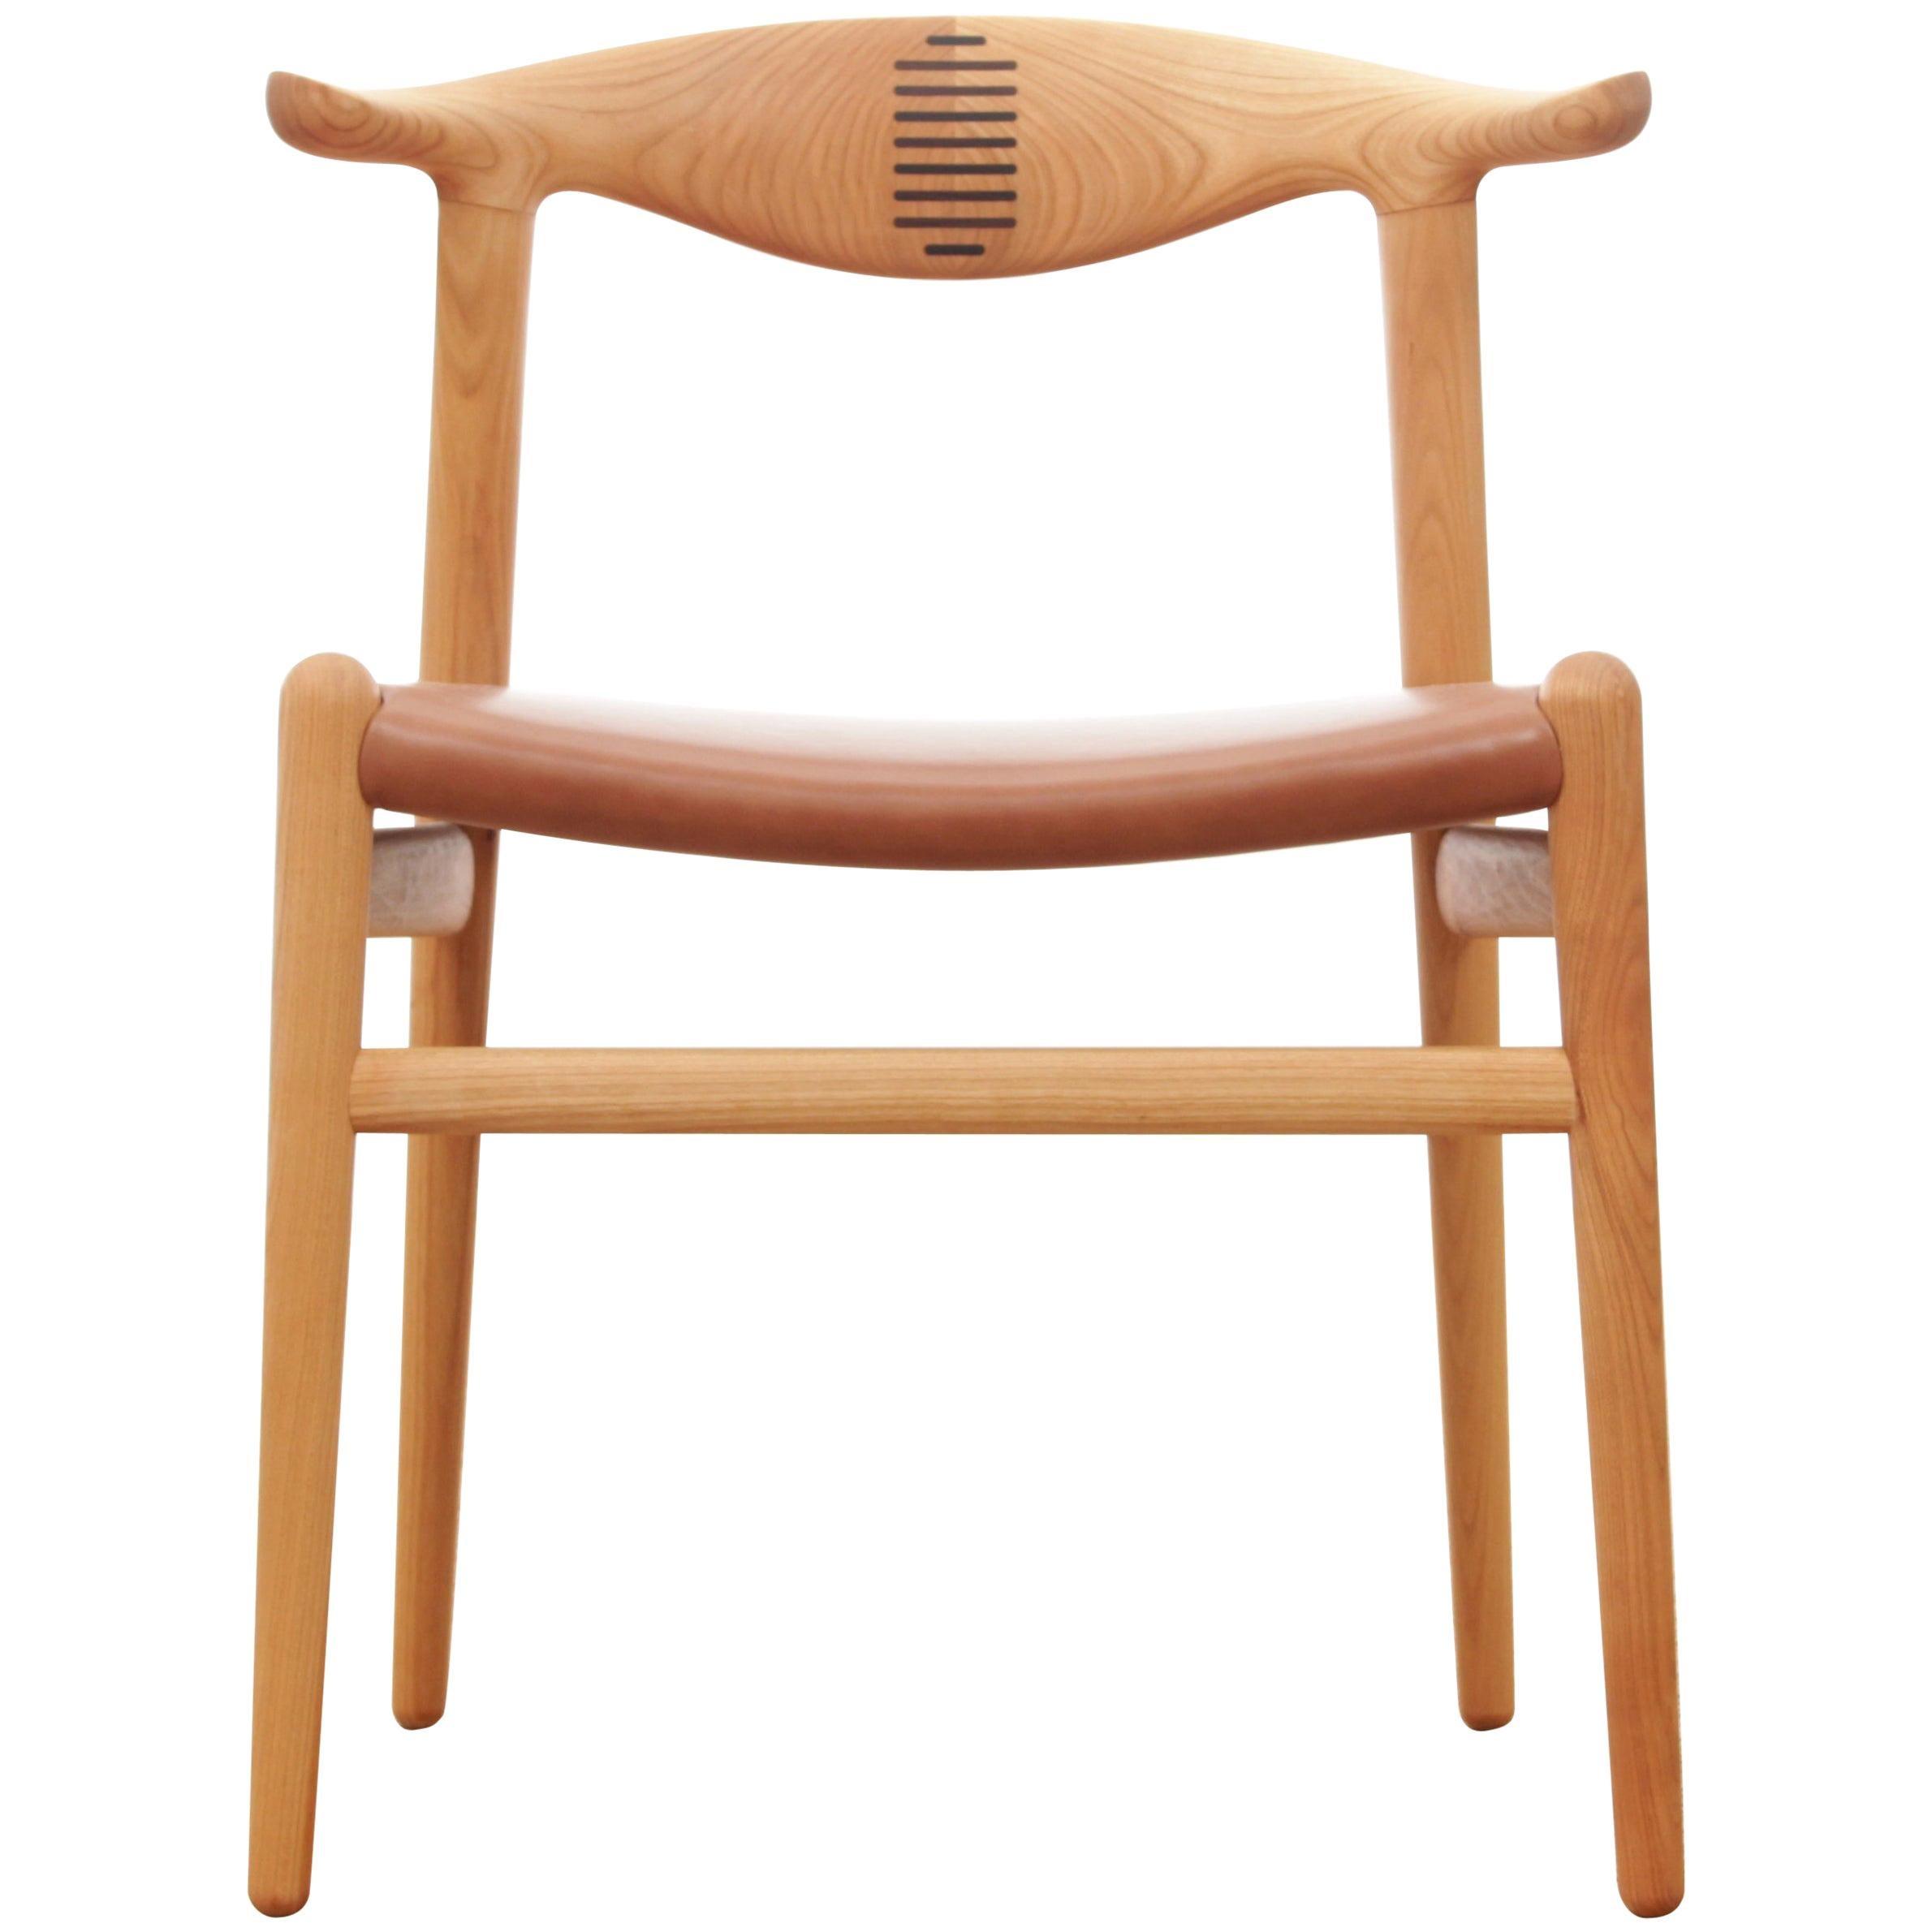 Mid-Century Modern Scandinavian Chair Model Cow Horn PP 505 by Hans Wegner